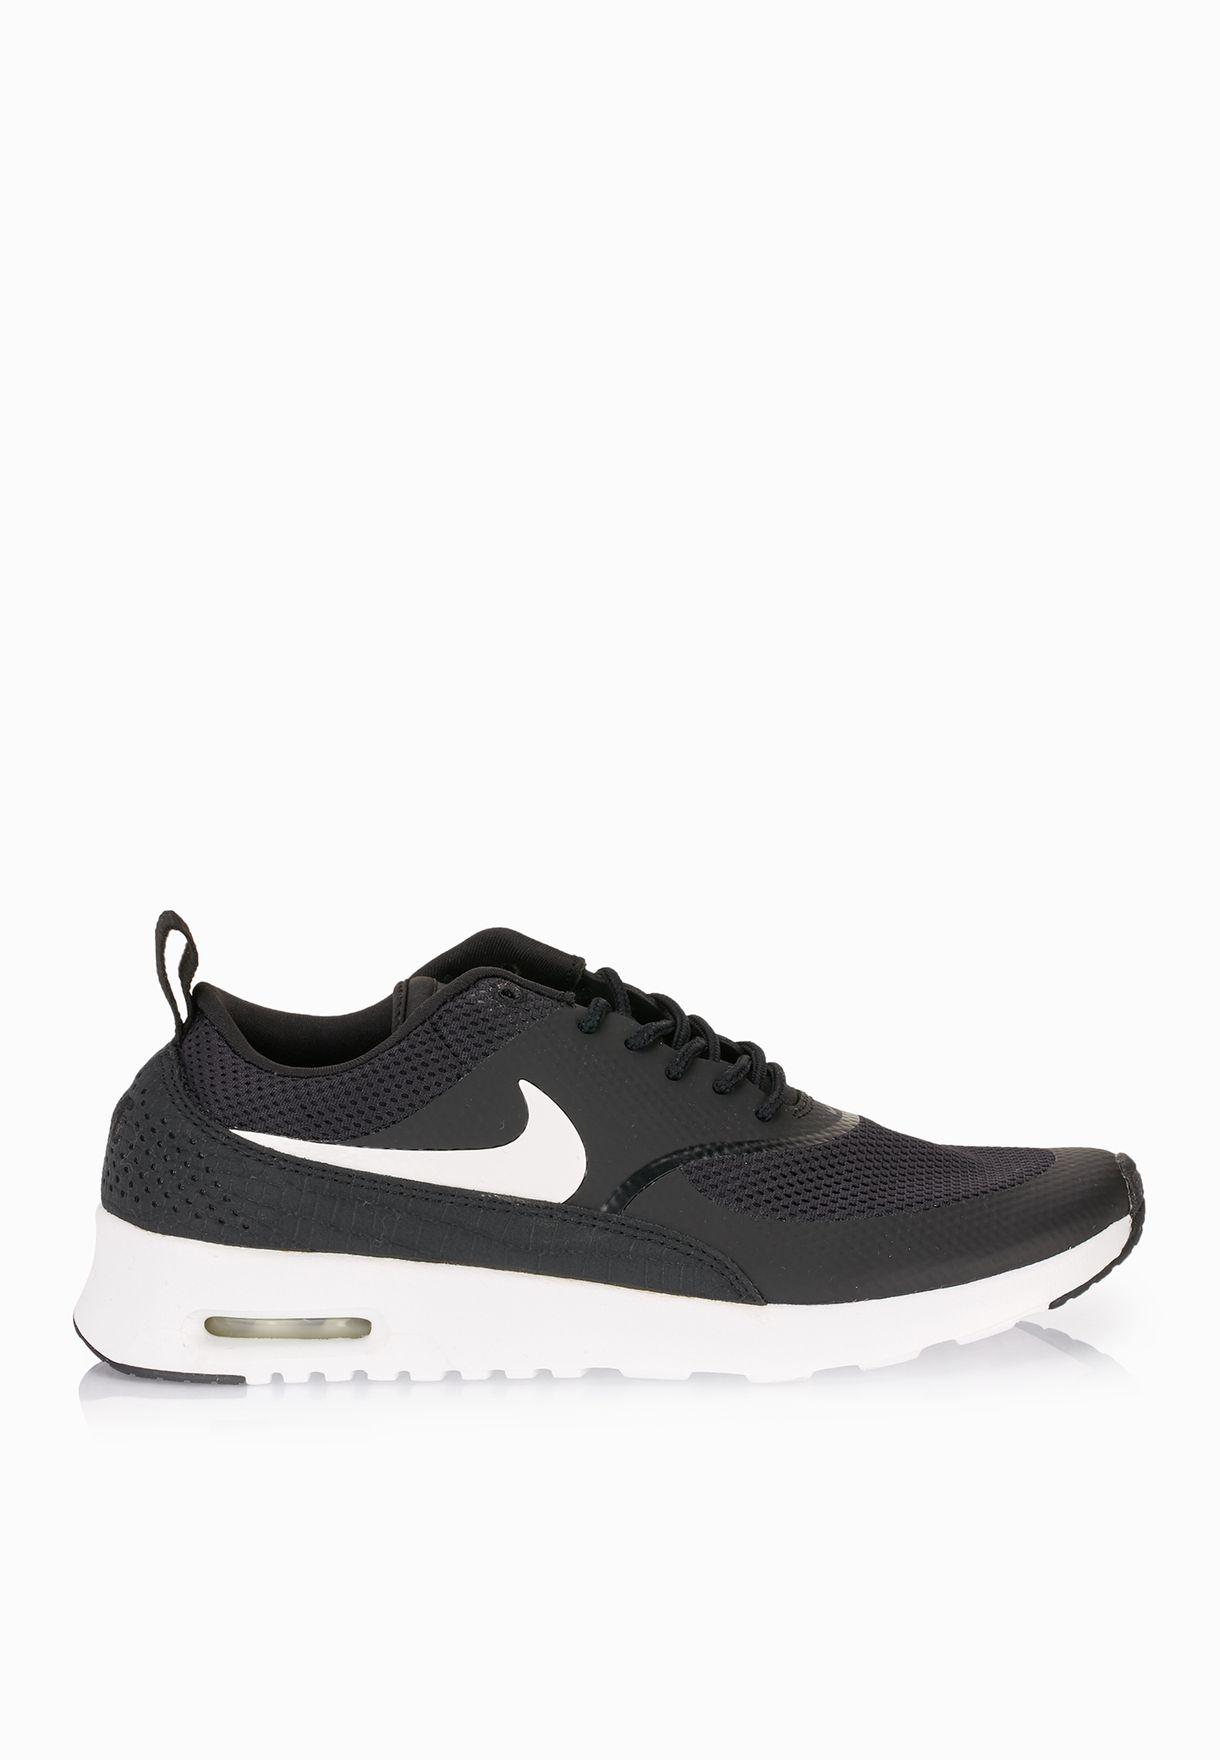 new product e1b65 51f71 Shop Nike black Air Max Thea 599409-020 for Women in UAE - N